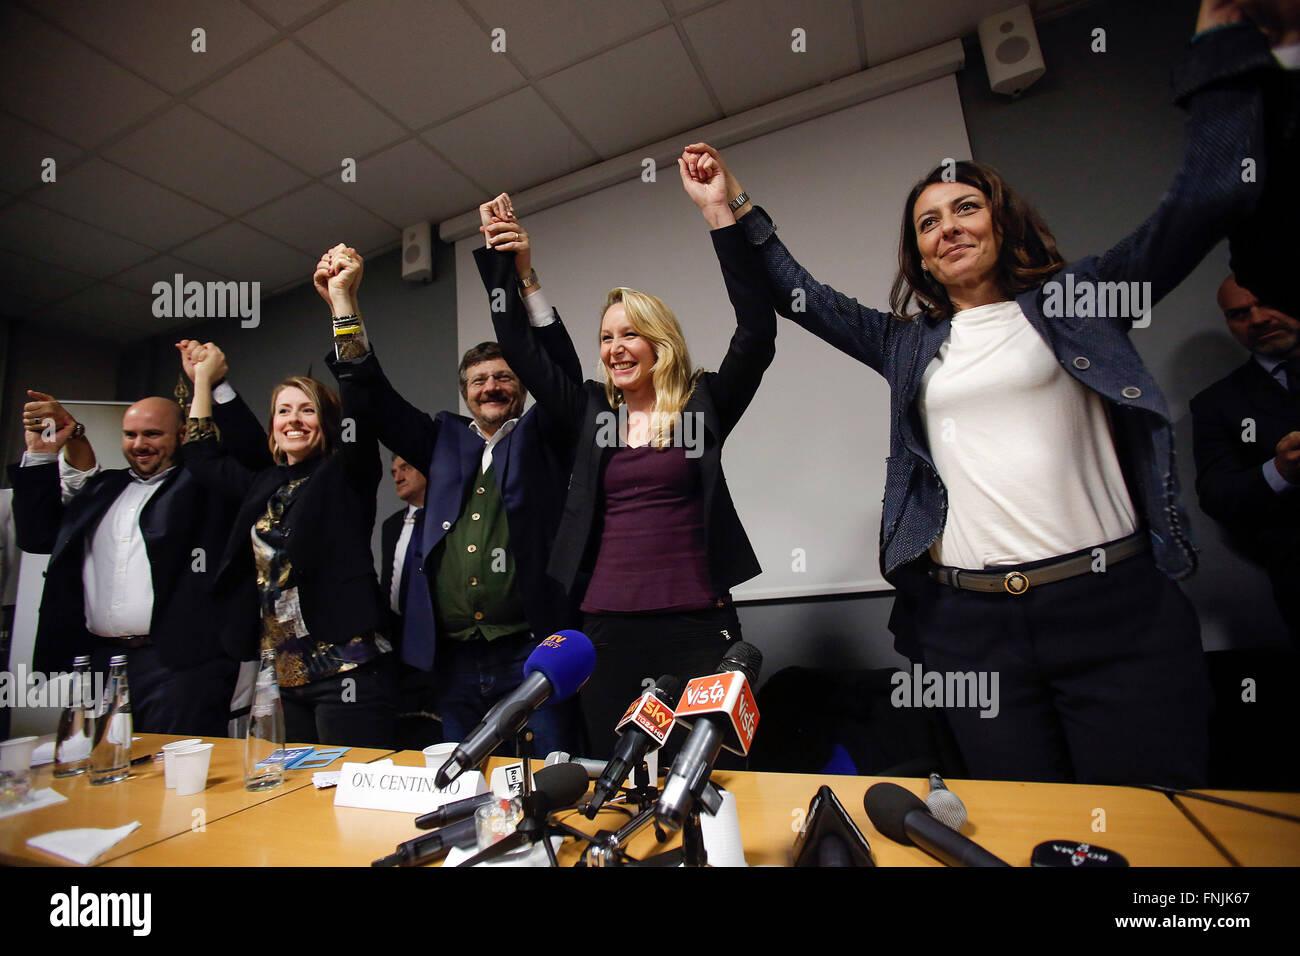 "Marion Chal Le Pen Roma 15.03.2016 Convegno 'L'Europa Delle Mille Patrie' Mar. Konvent ""Europa Stockbild"